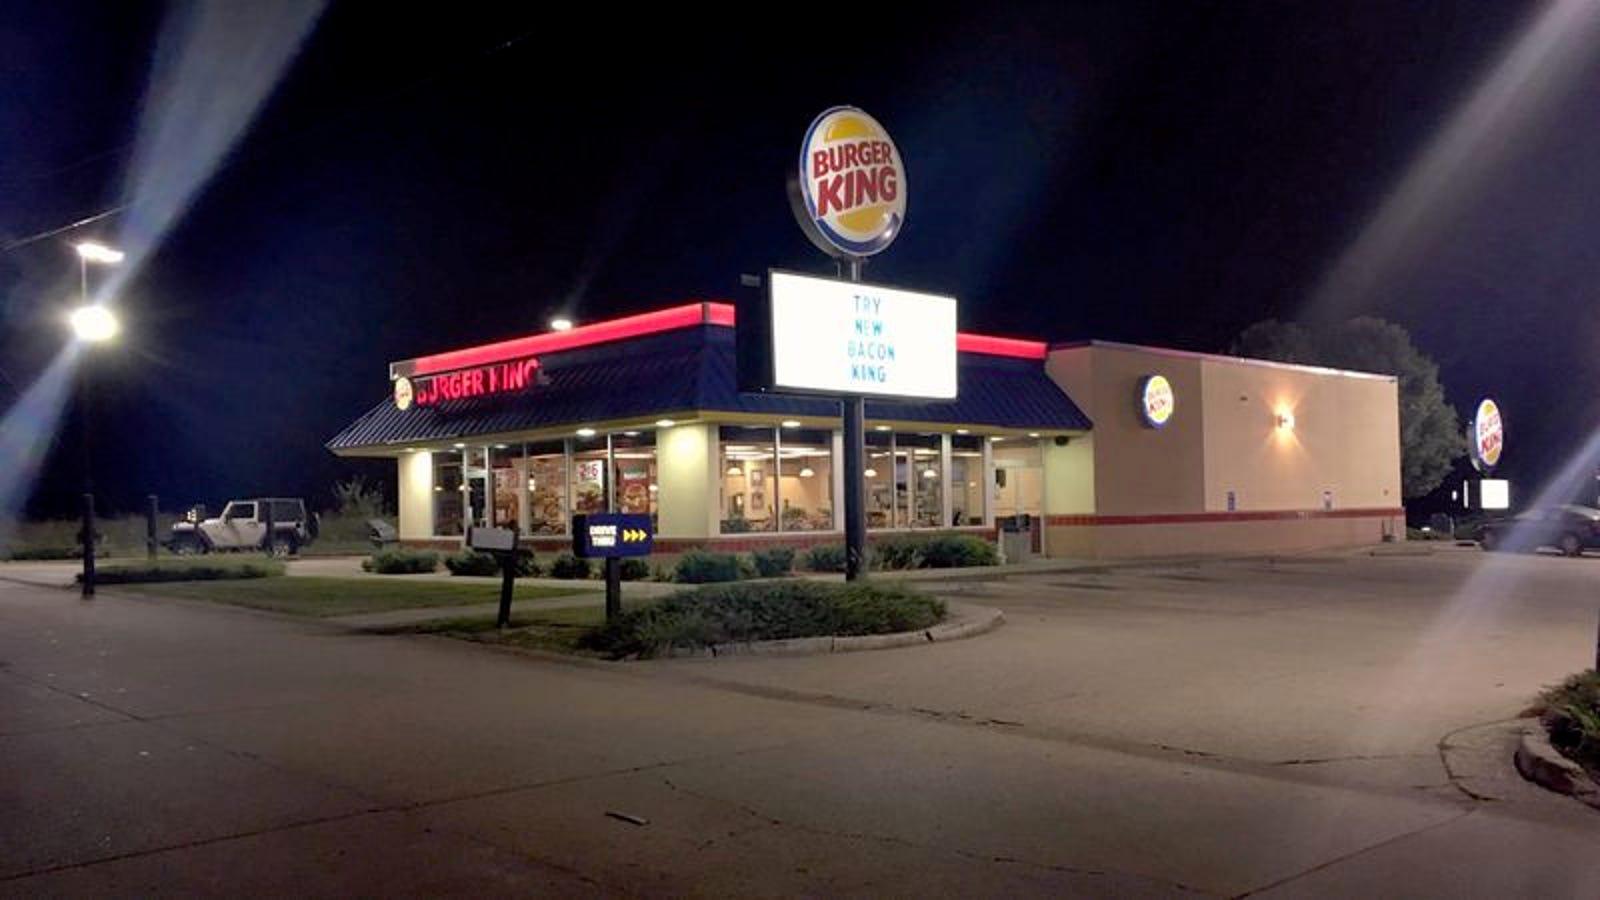 Burger King Looks Open